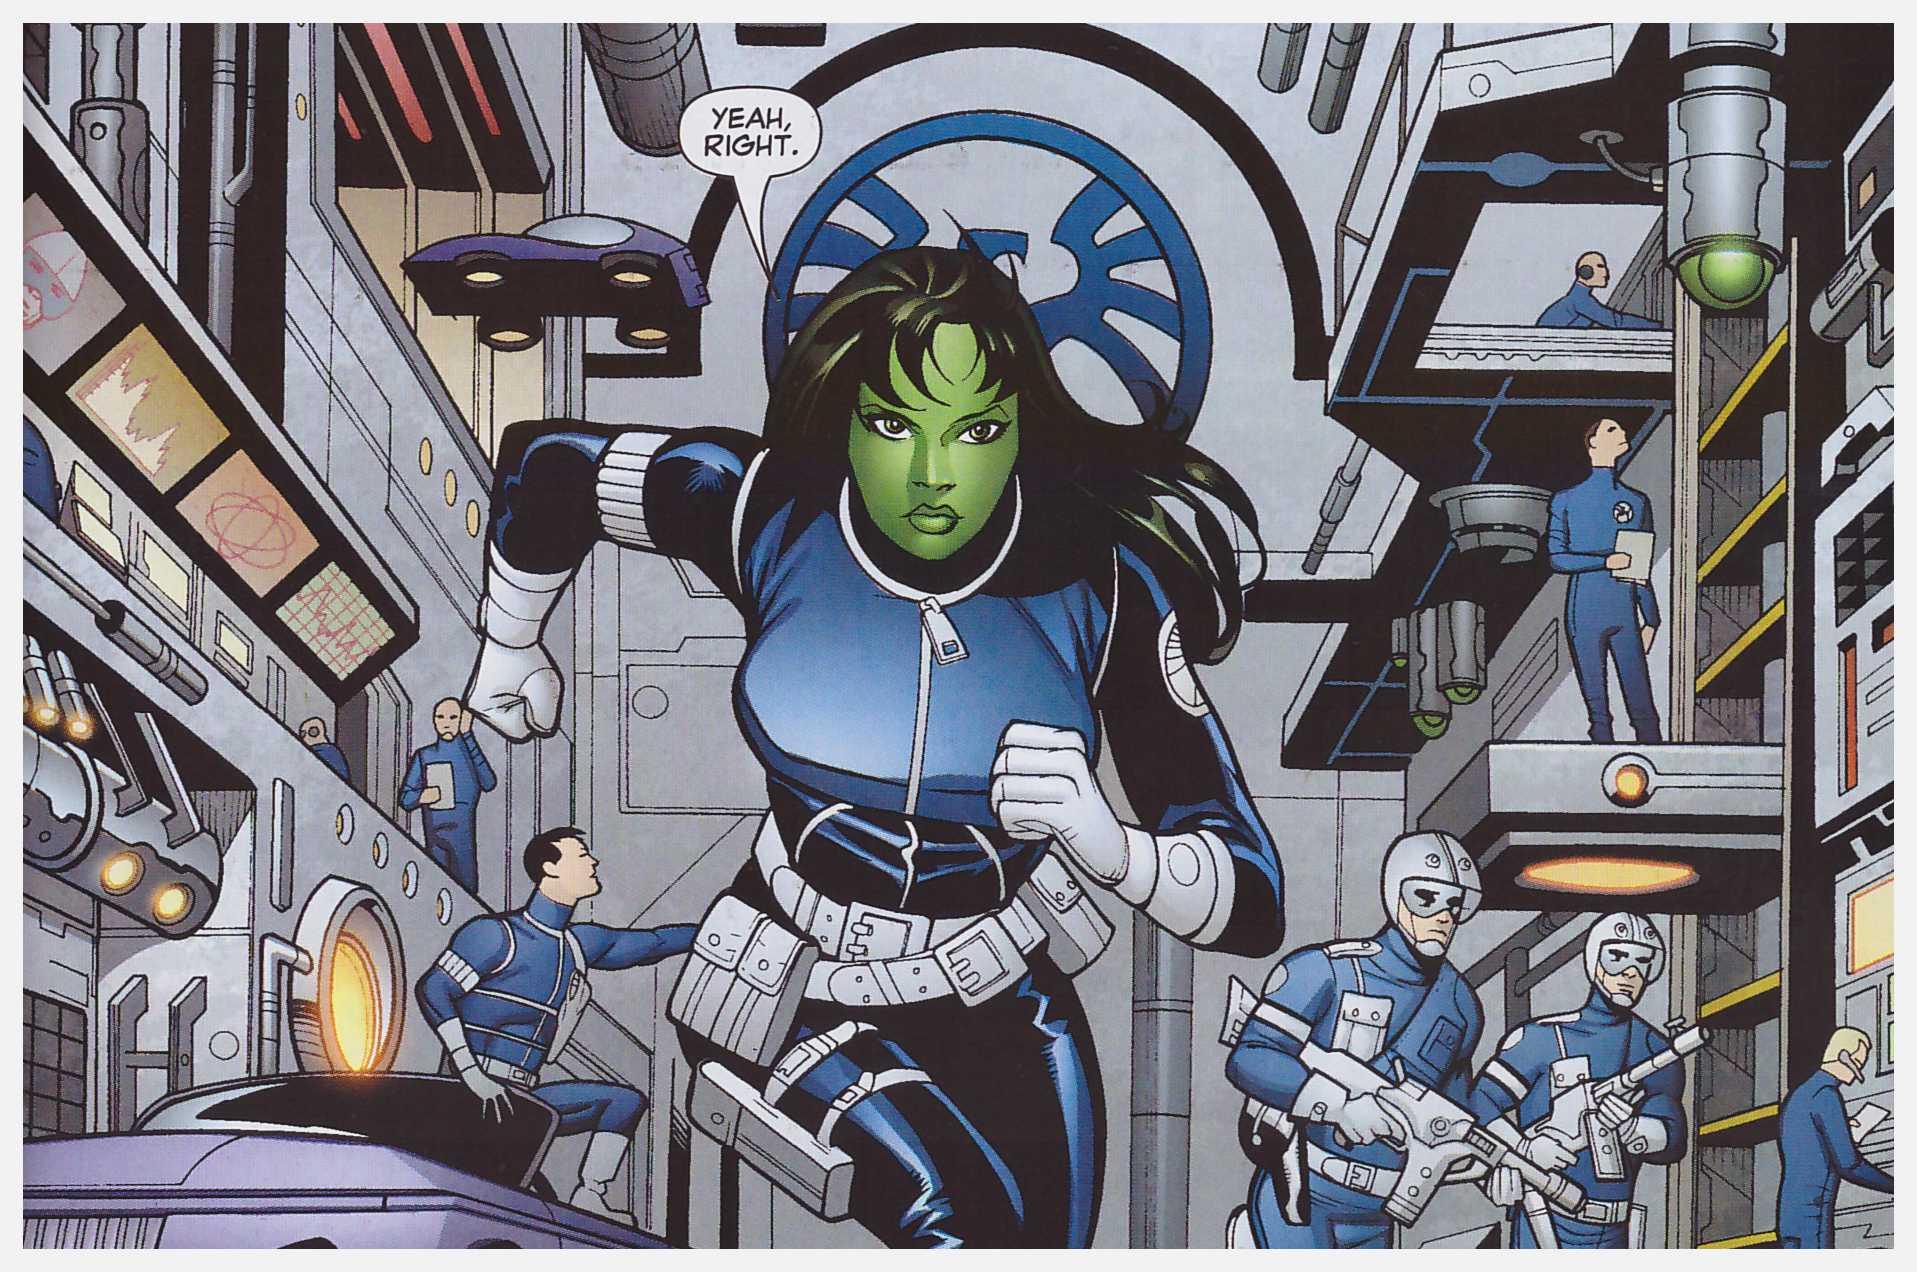 She-Hulk by Dan Slott review